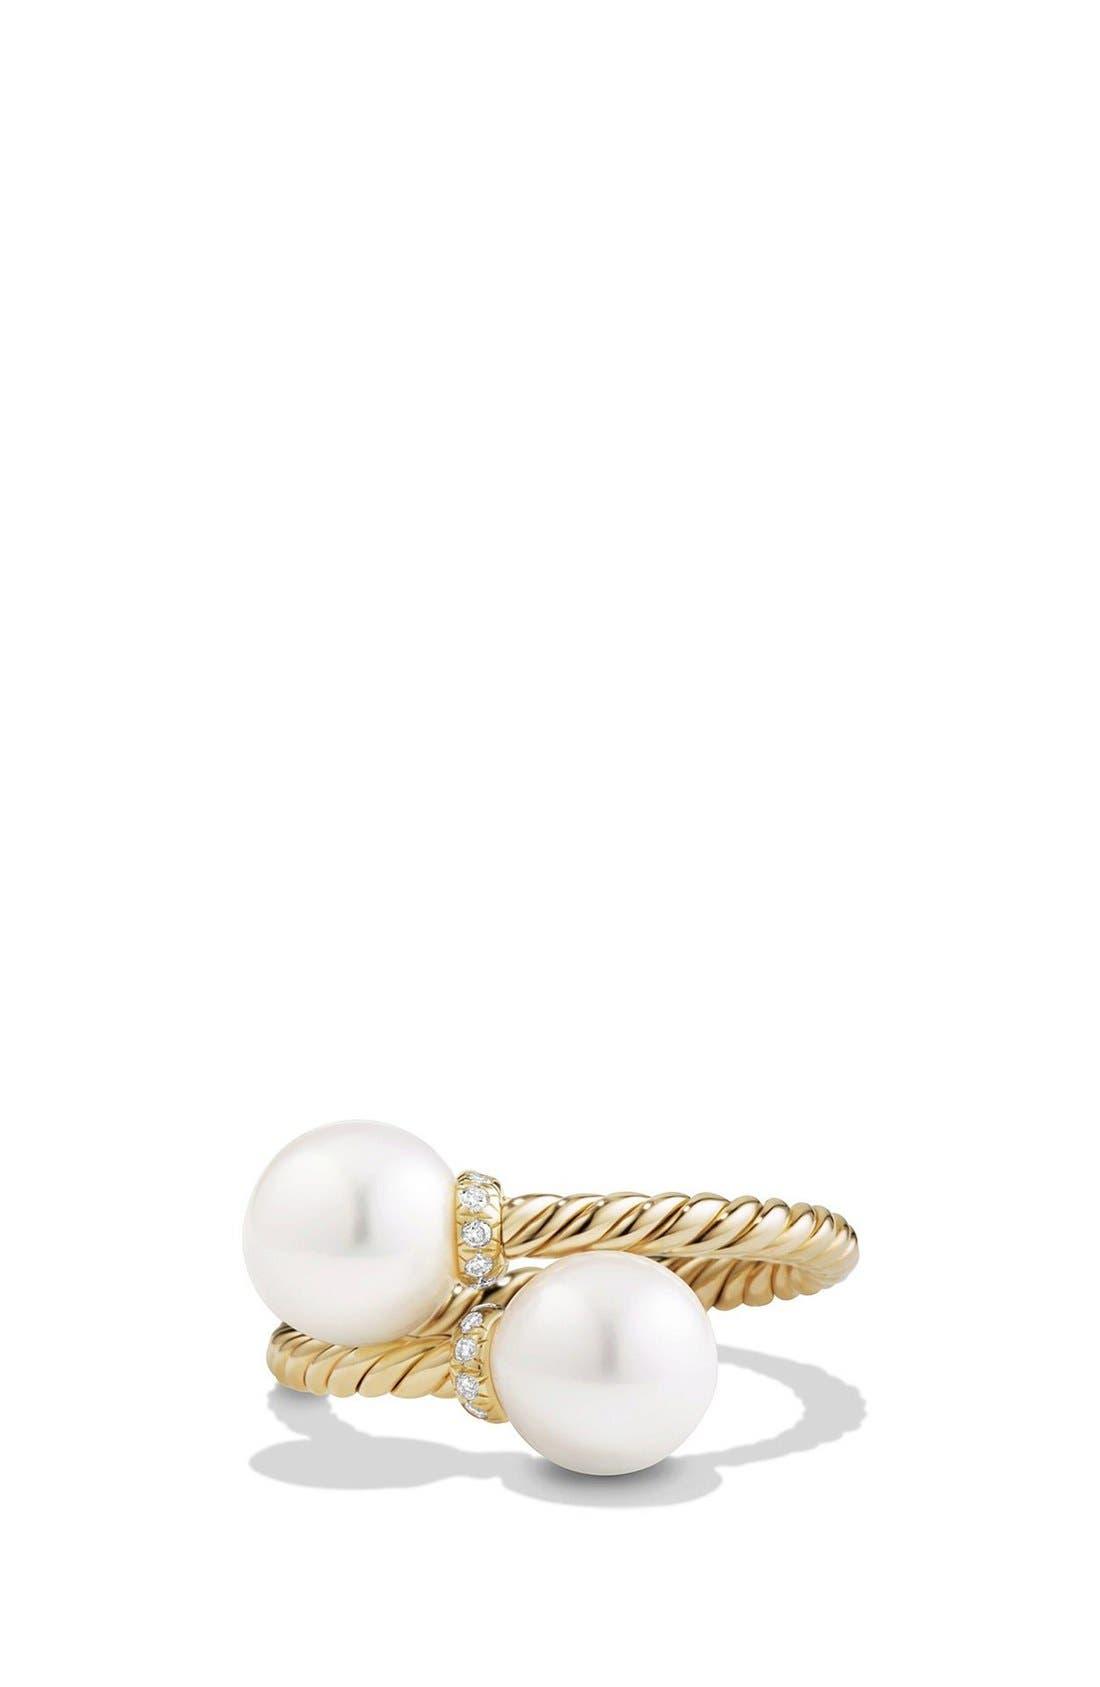 DAVID YURMAN Solari Bead Ring with Diamonds and Pearls in 18K Gold